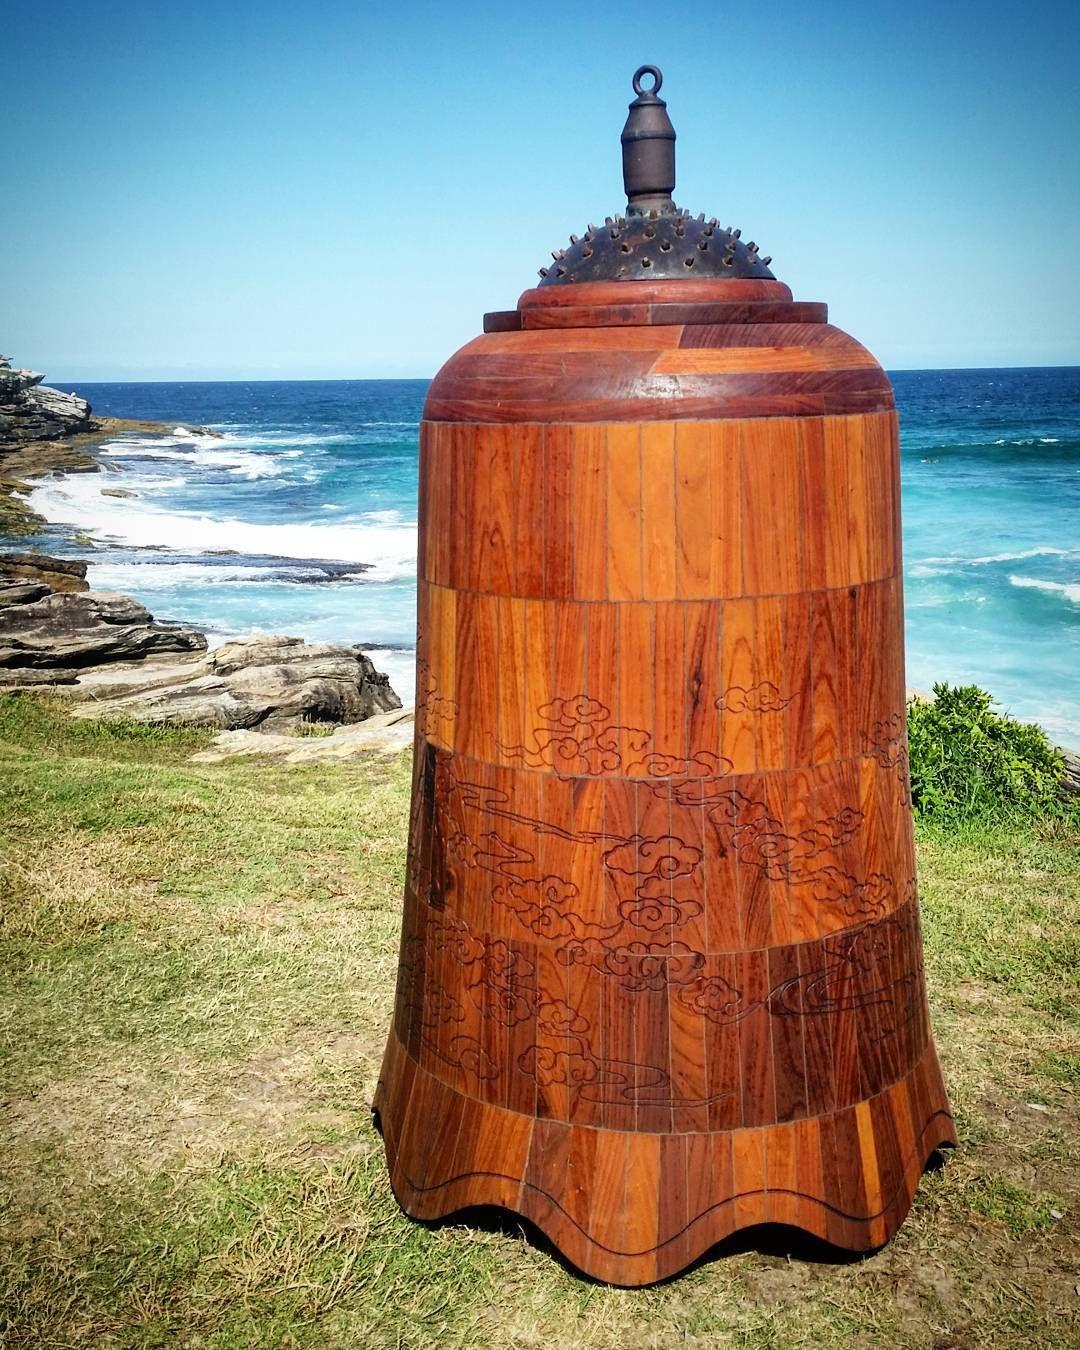 #bell #wooden #sydney #australia #igerssydney #sculpturebythesea #bonditobronte #australiagram by grgrgrshark http://ift.tt/1KBxVYg